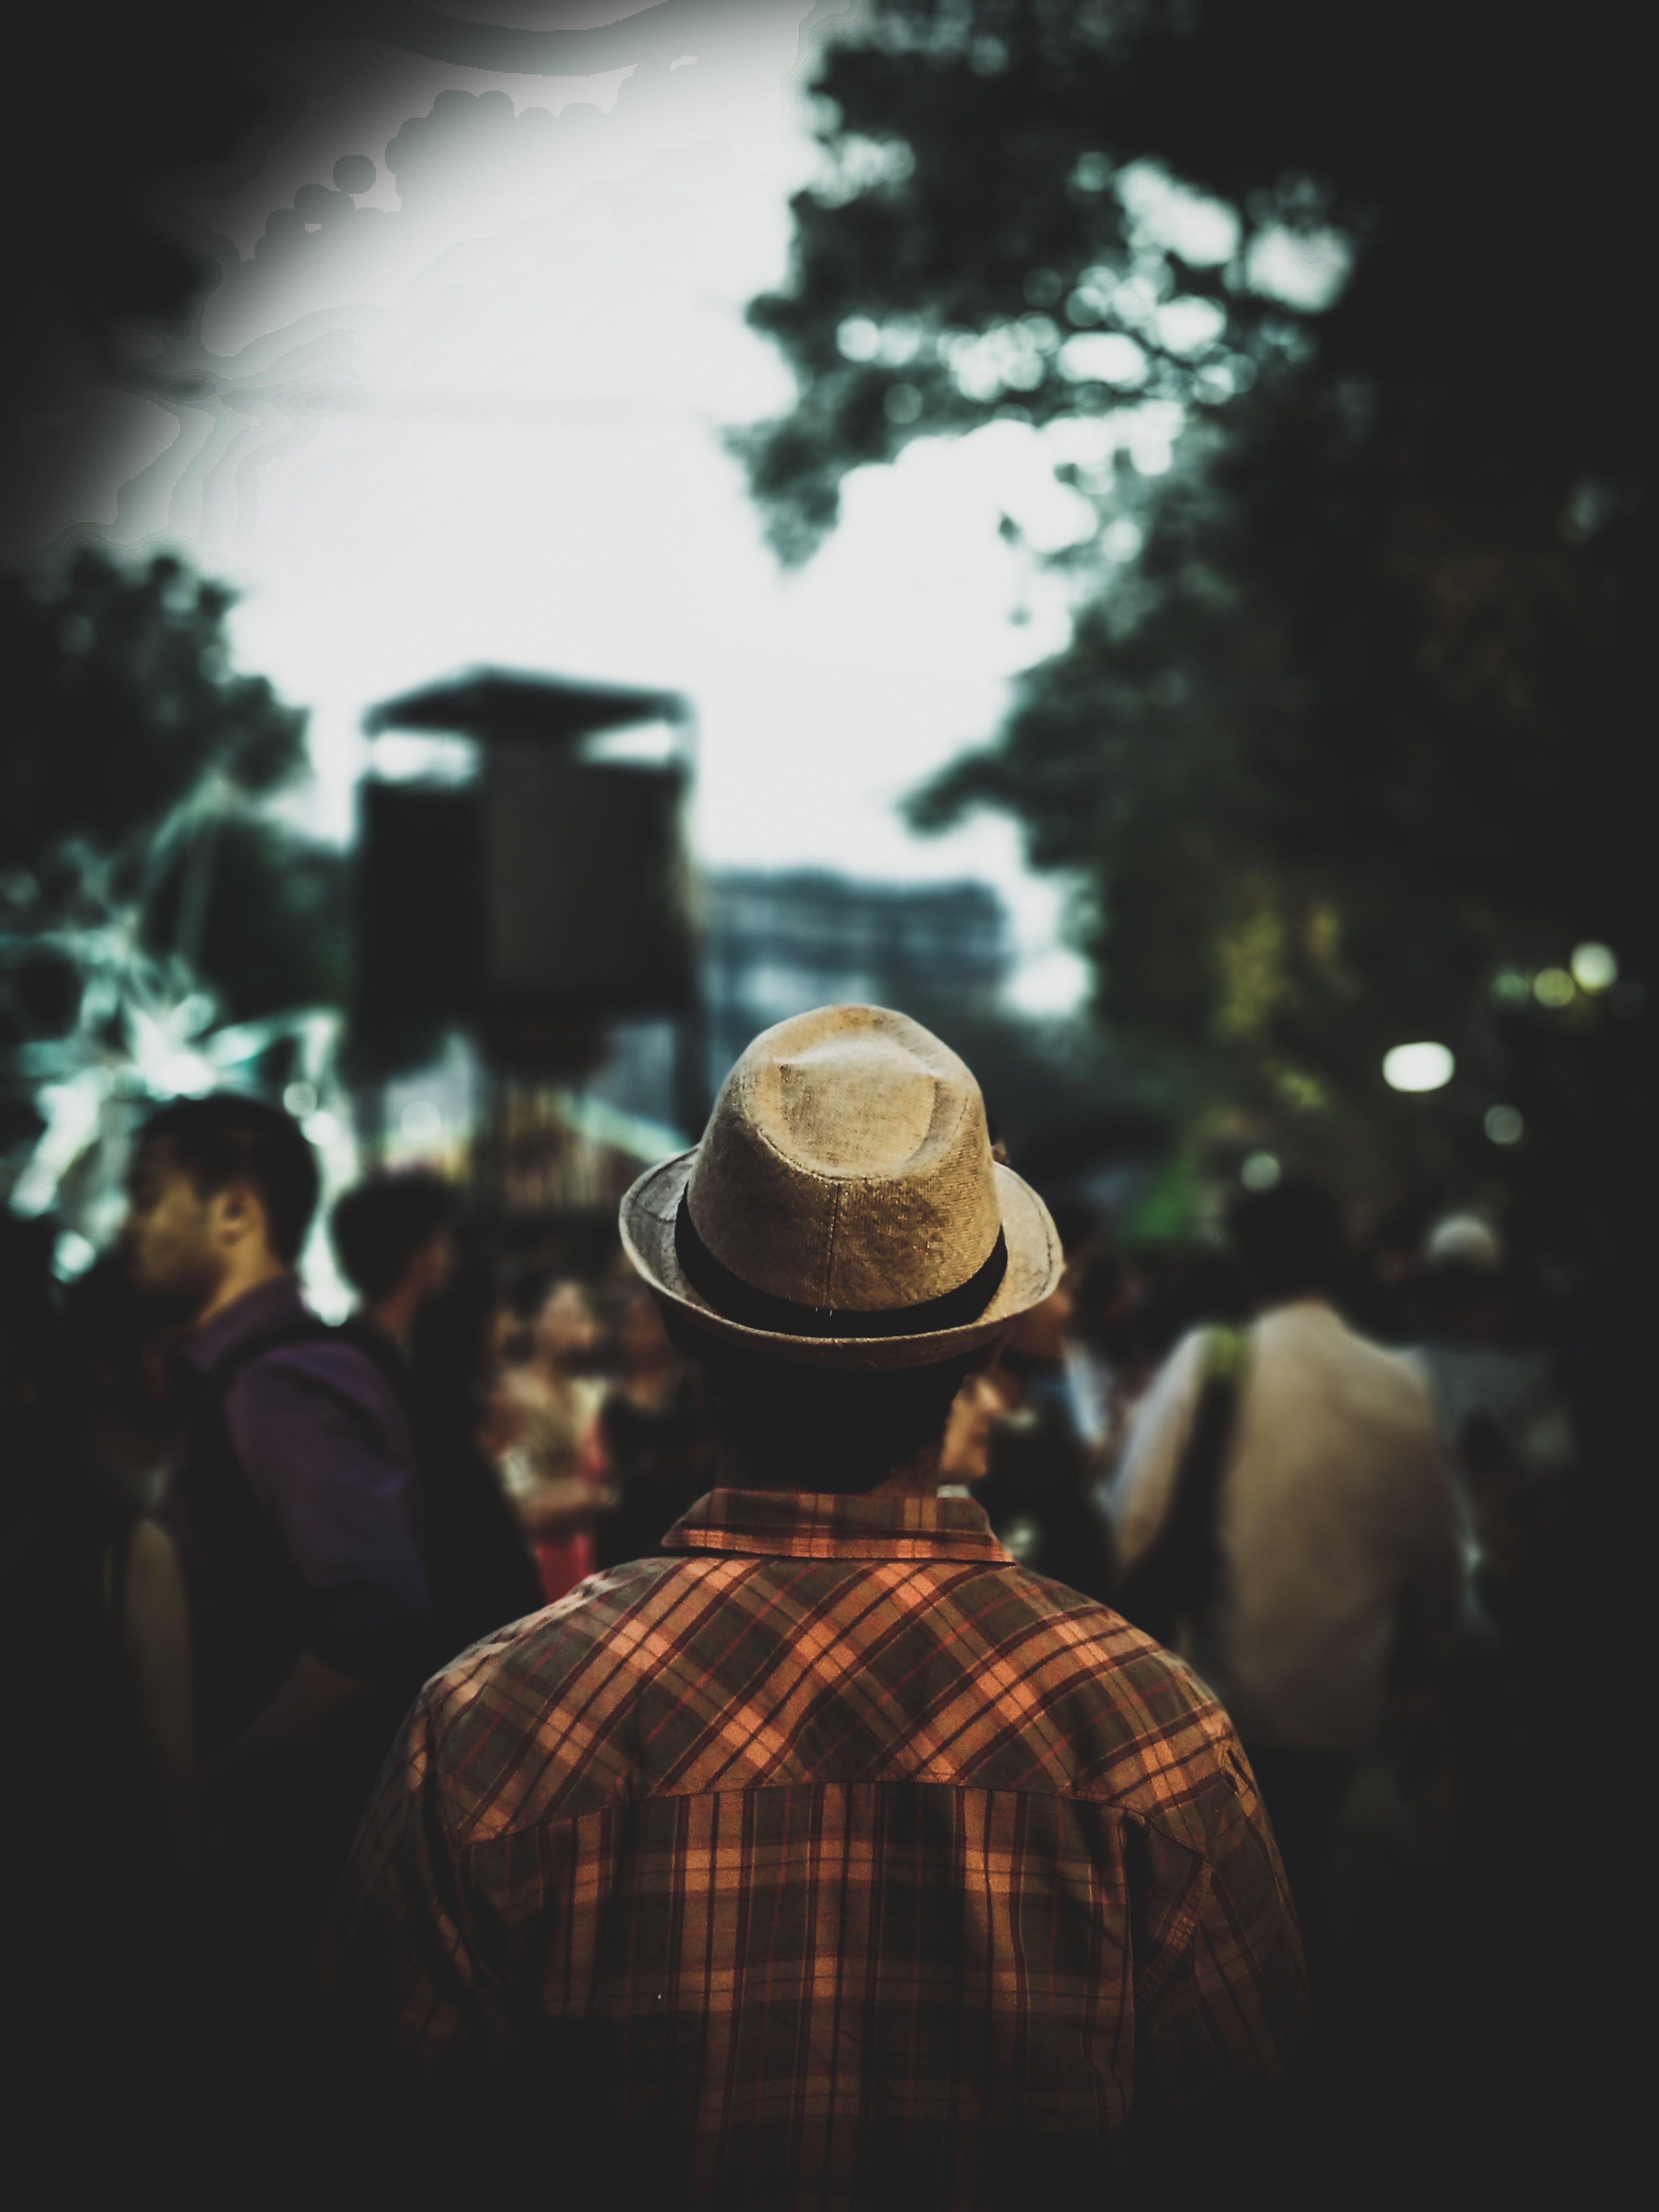 Man Wearing Fedora Hat and Plaid Shirt Facing People